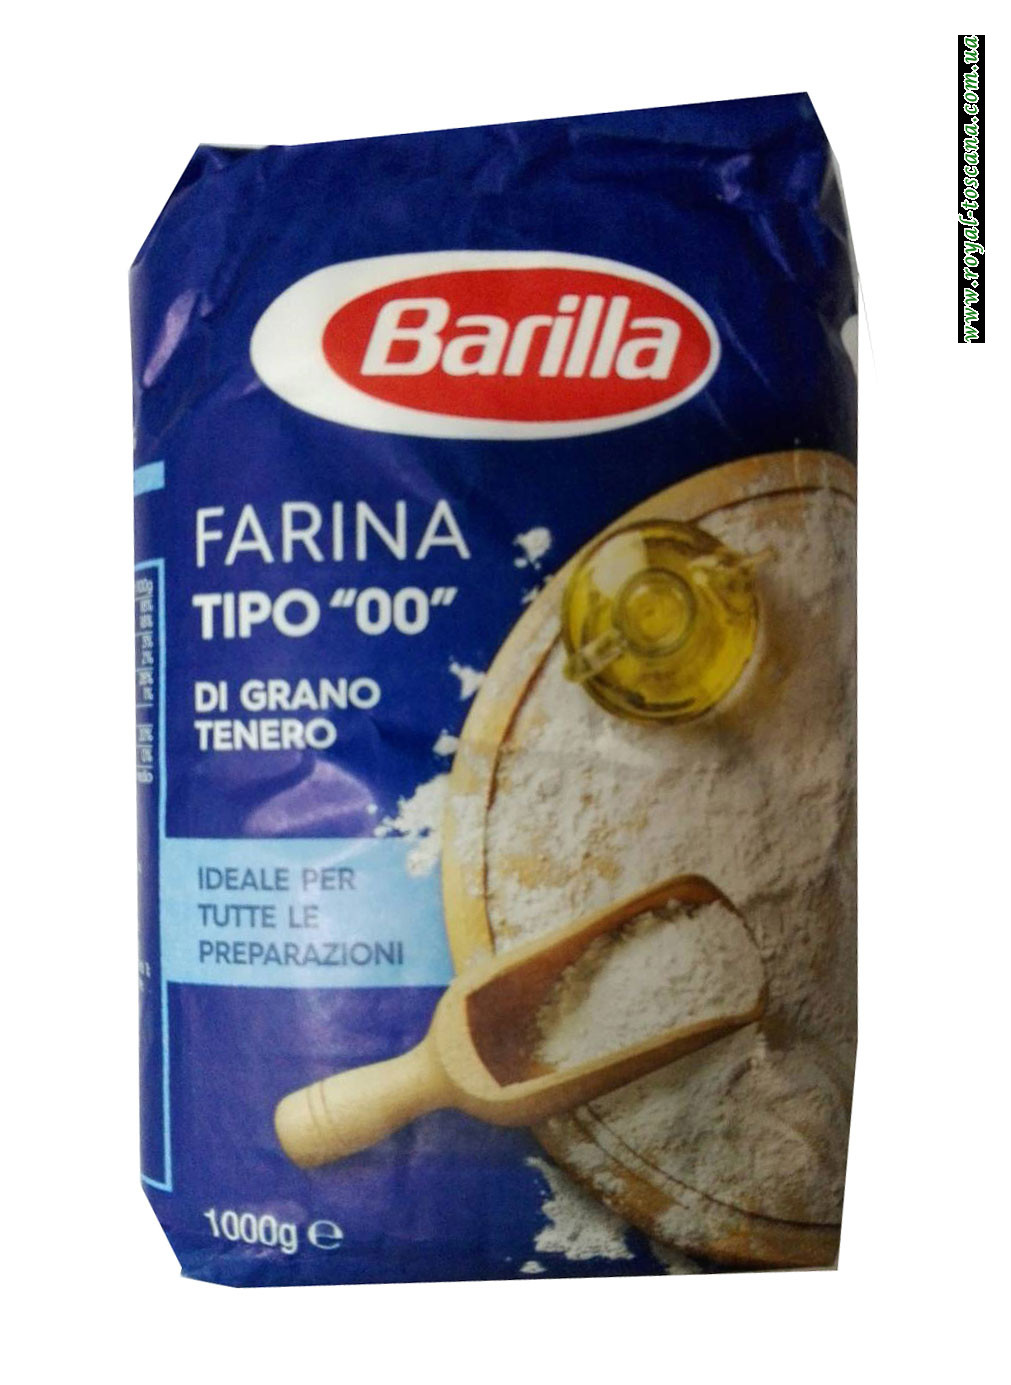 Мука пшеничная Barilla Farina Tipo 00